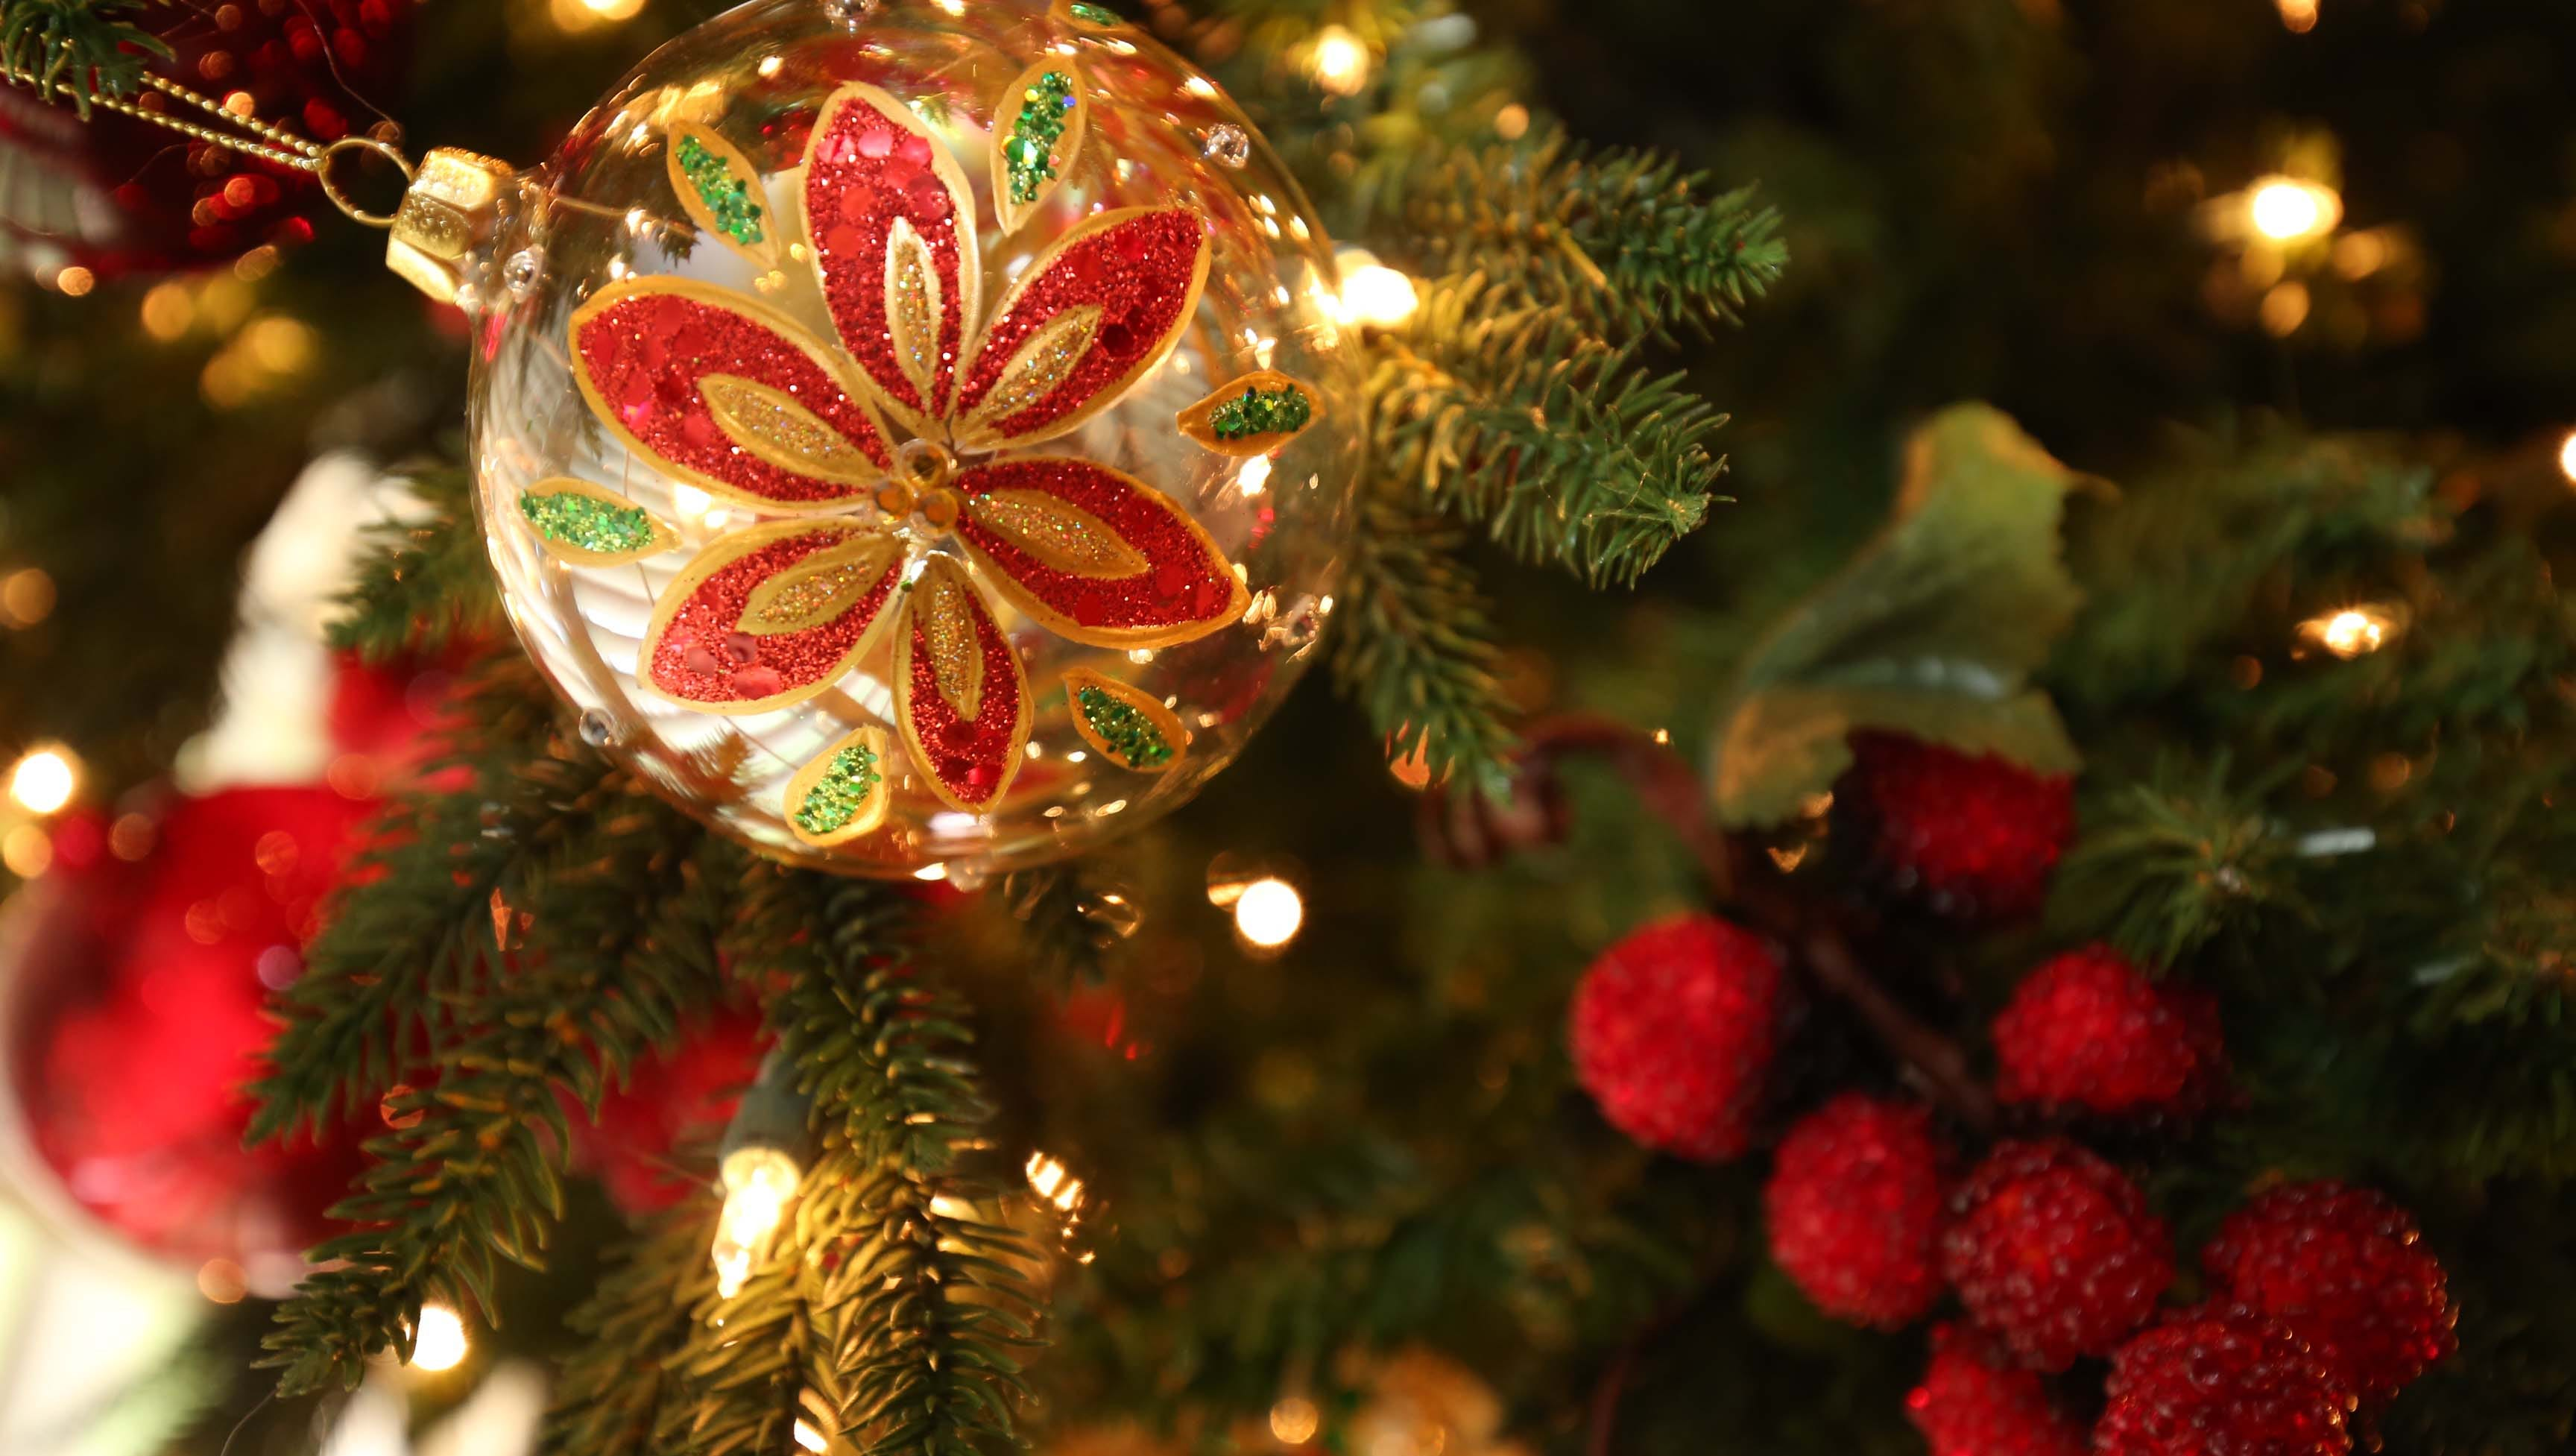 Restaurants Open On Christmas Day 2020 Monett Mo A collection of restaurants open for Christmas Eve and Day